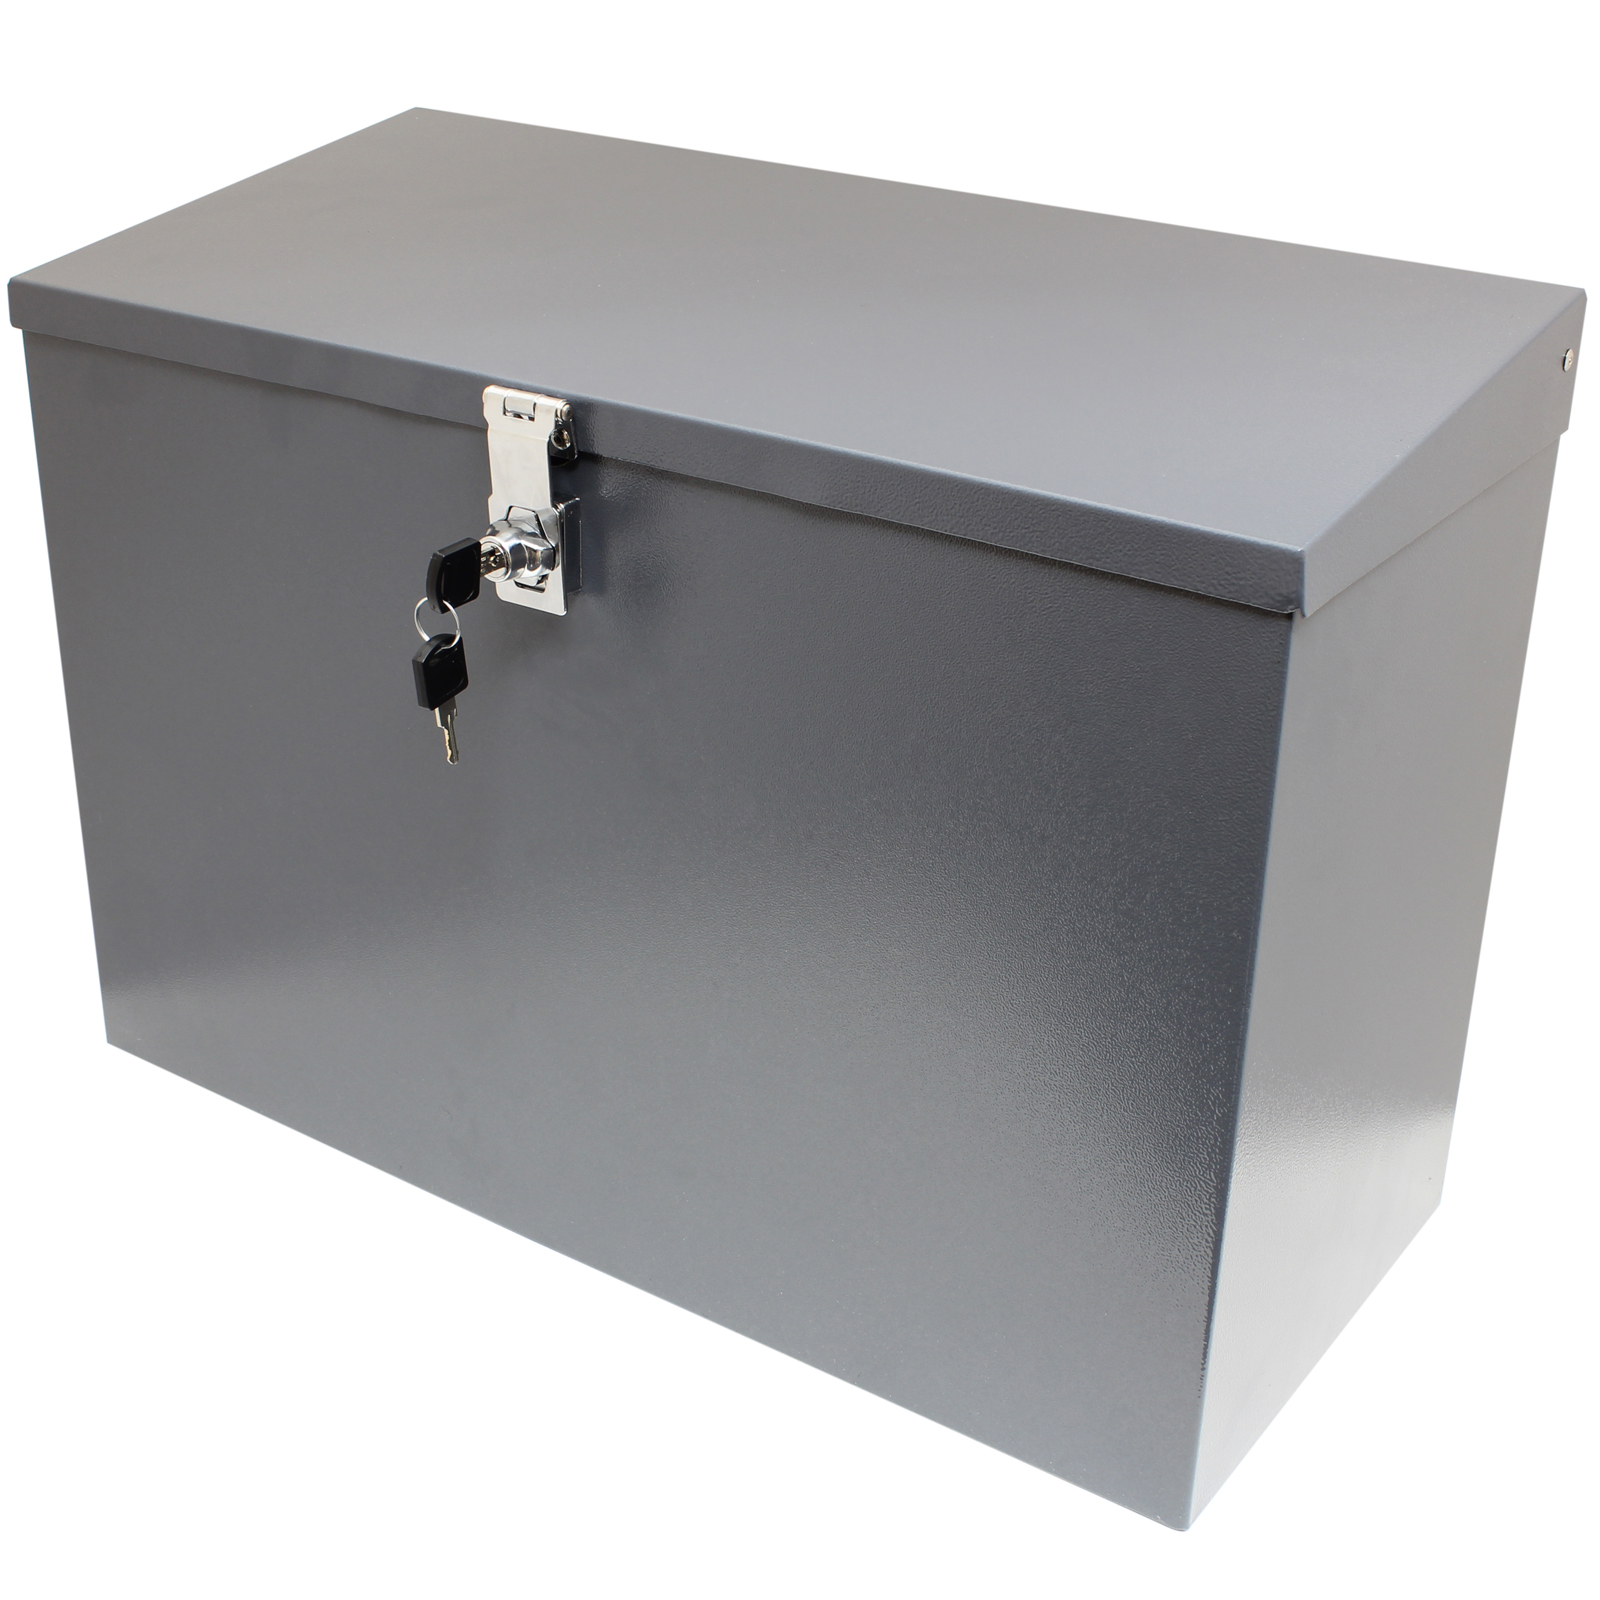 Sentinel HARDCASTLE LARGE GREY LOCKABLE LETTERBOX/PARCEL BOX HOME DELIVERY  SECURE STORAGE